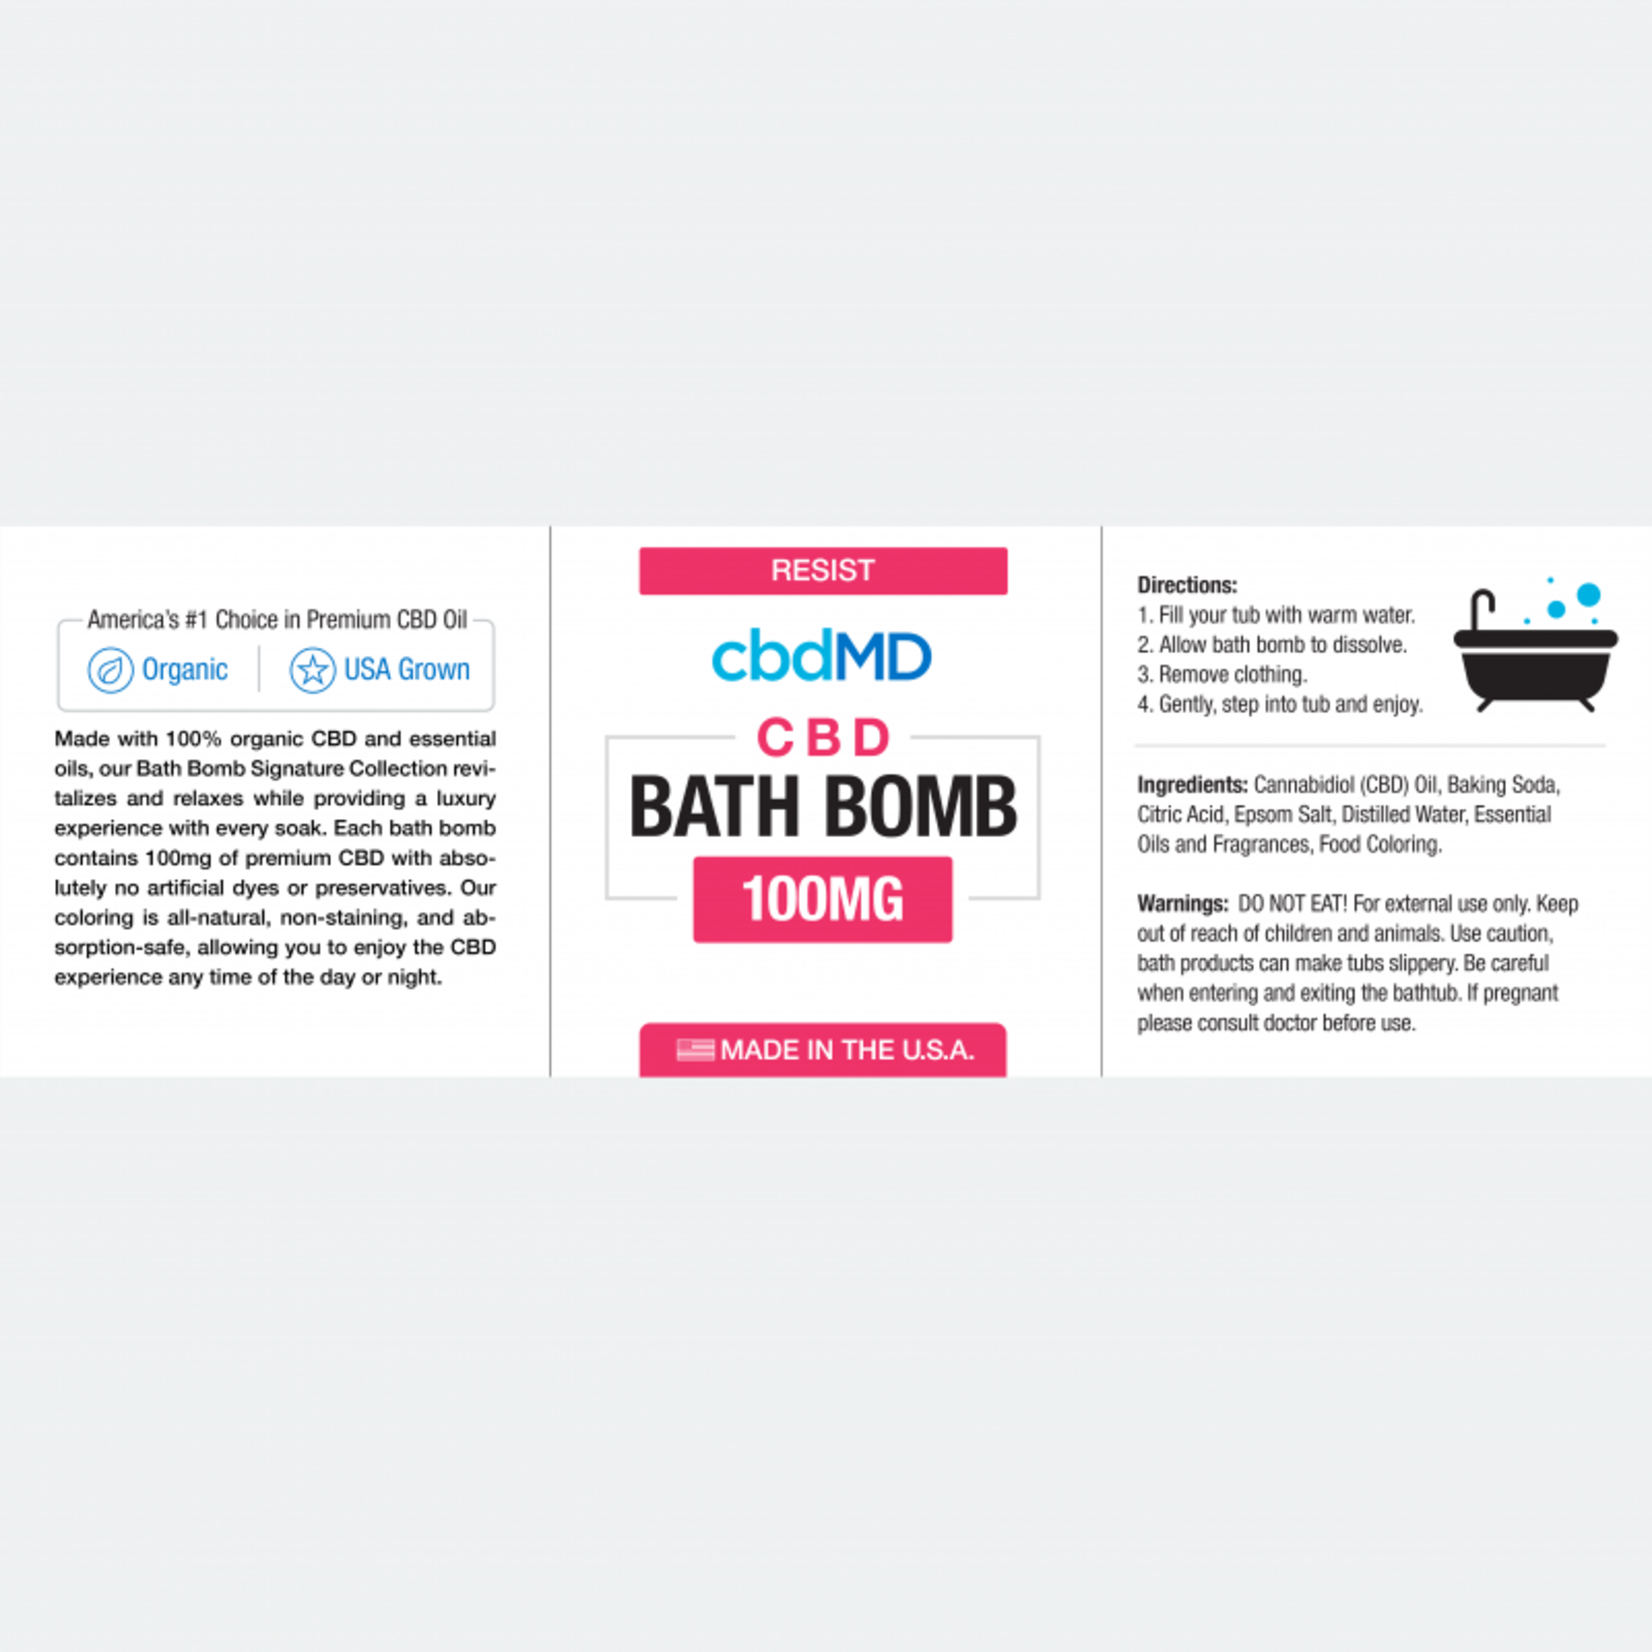 CBD Bath Bombs Resist